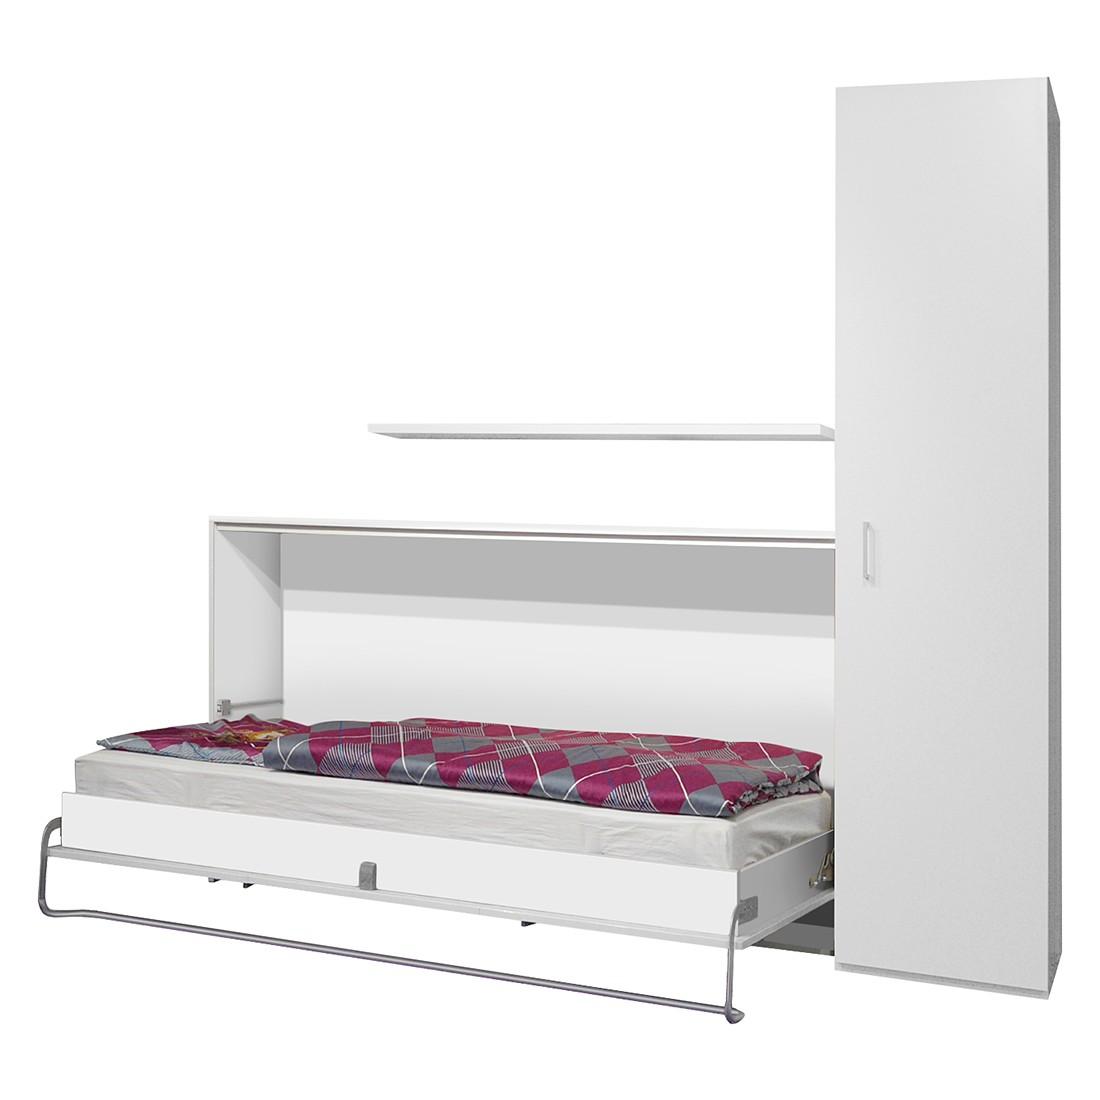 home24 Schrankbett-Kombination Godia II | Schlafzimmer > Betten > Schrankbetten